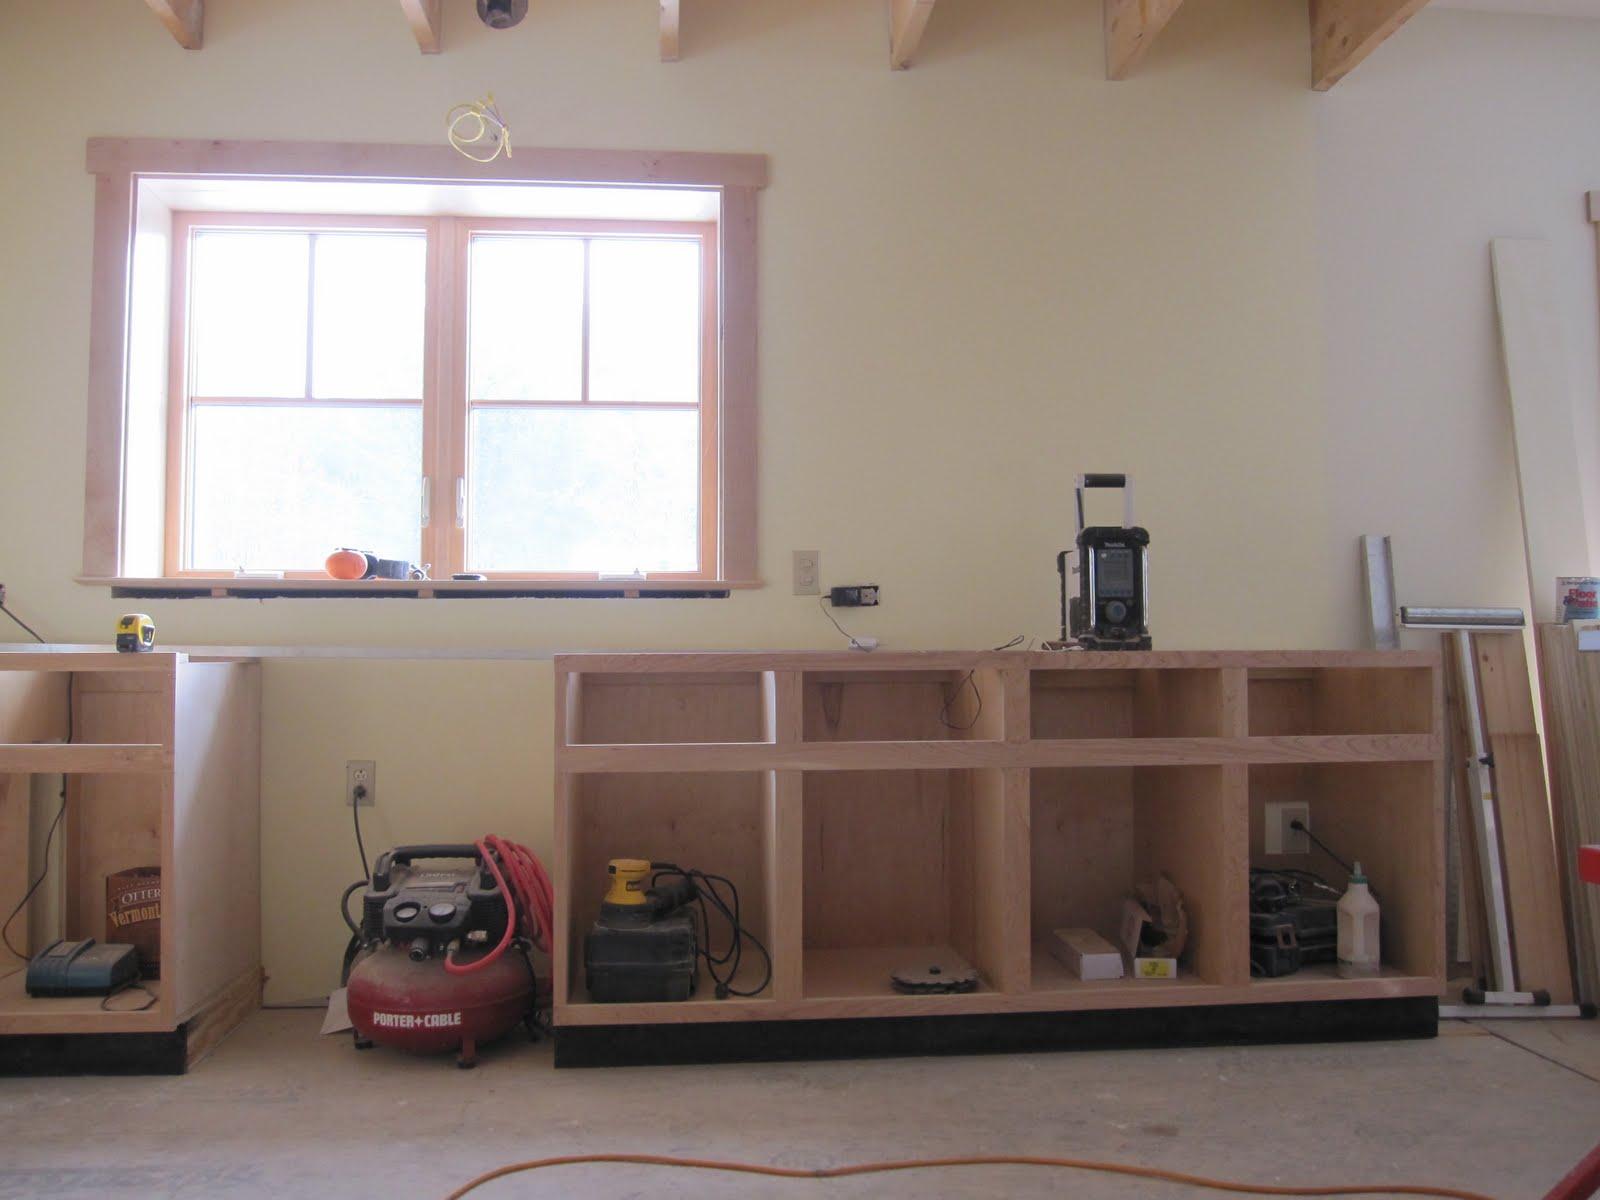 Lay Down A Kitchen Floor Under Cabinets